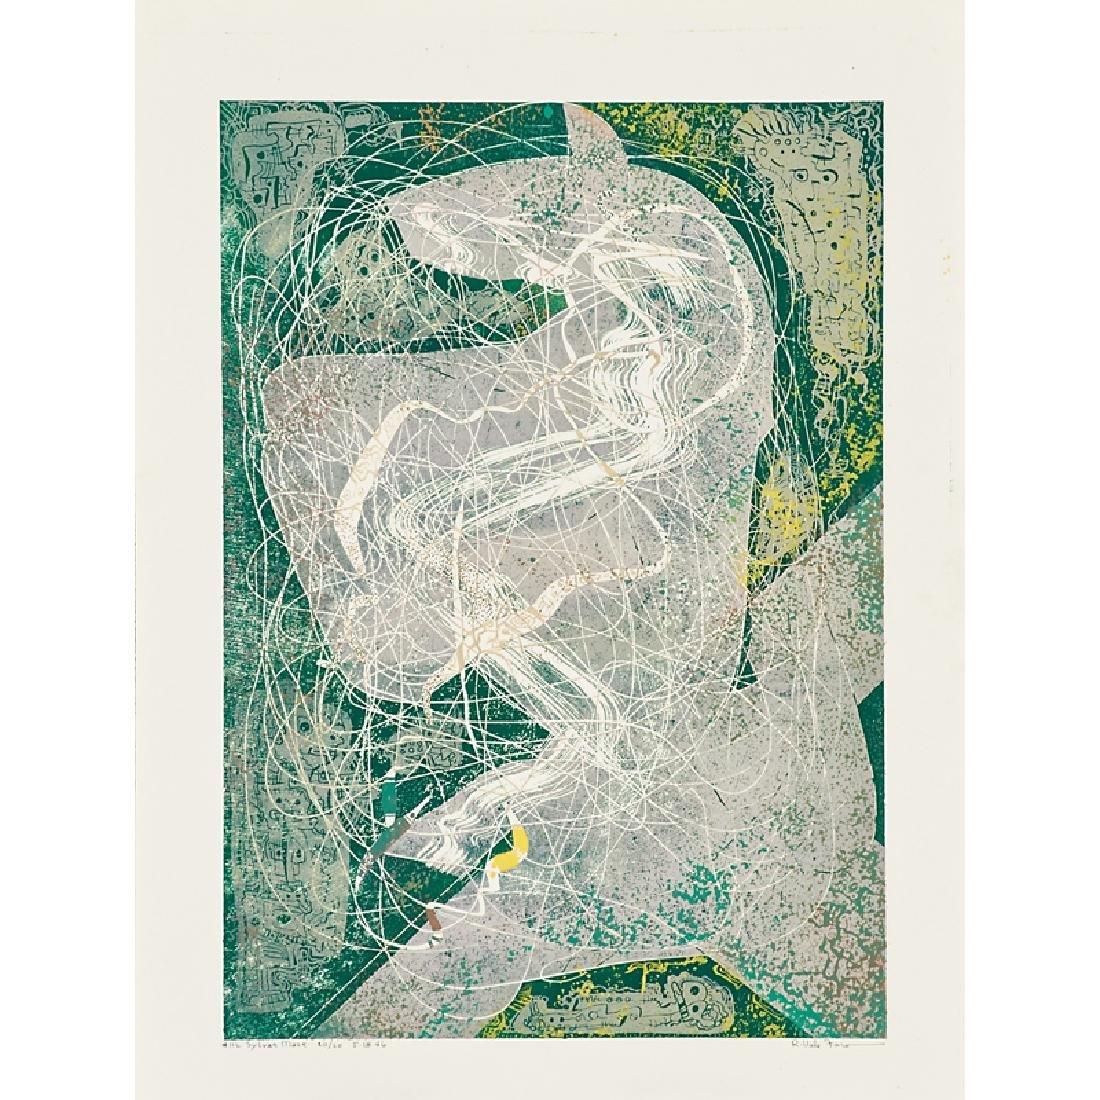 ROBERT VALE FARO (American, 1902-1988) - 8